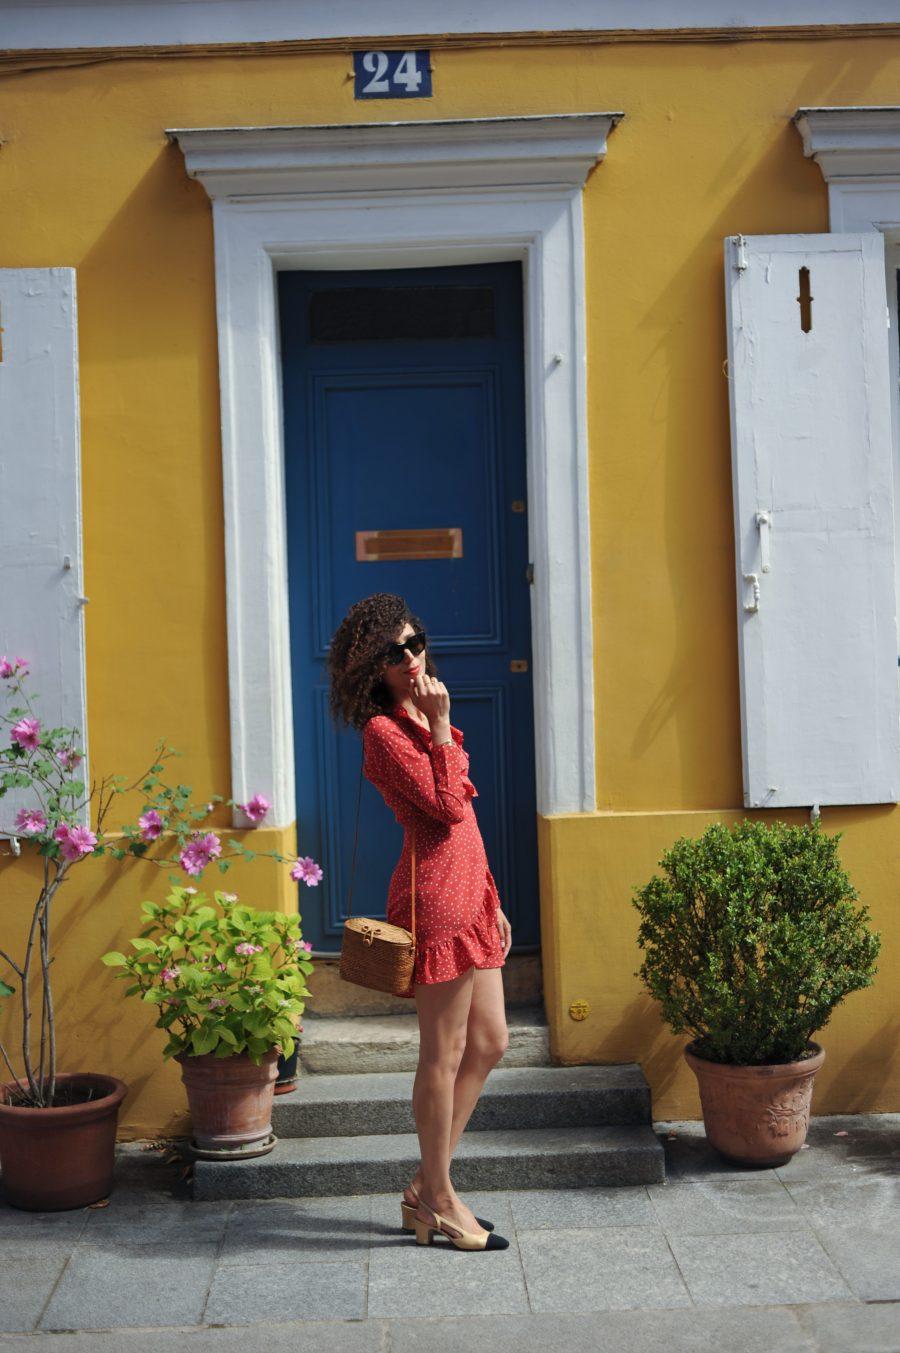 la-petite-robe-rouge-paris-14